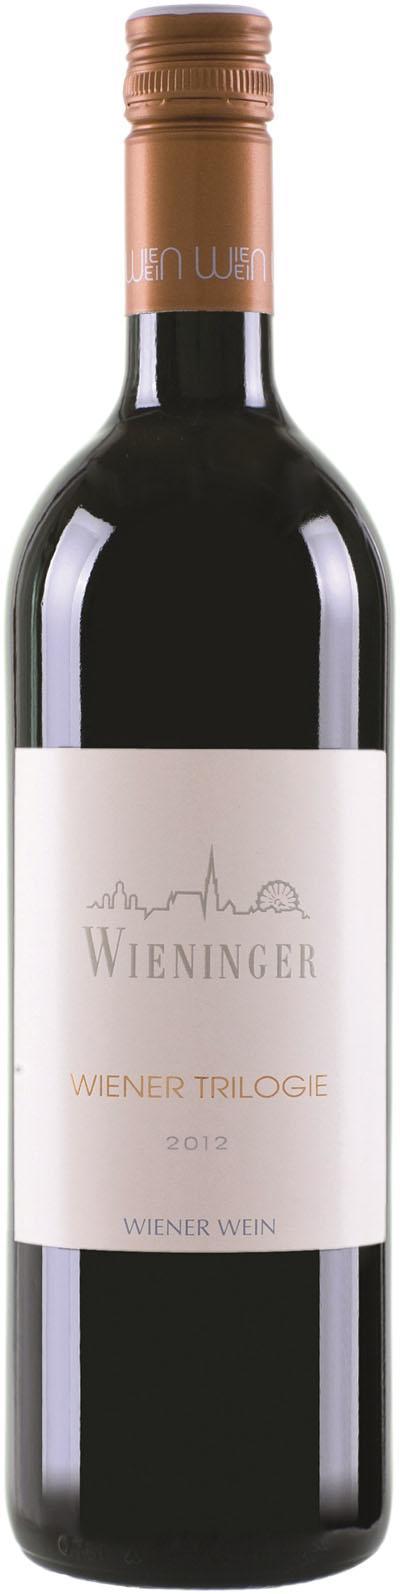 Cuvee Wiener Trilogie 2015 / Wieninger